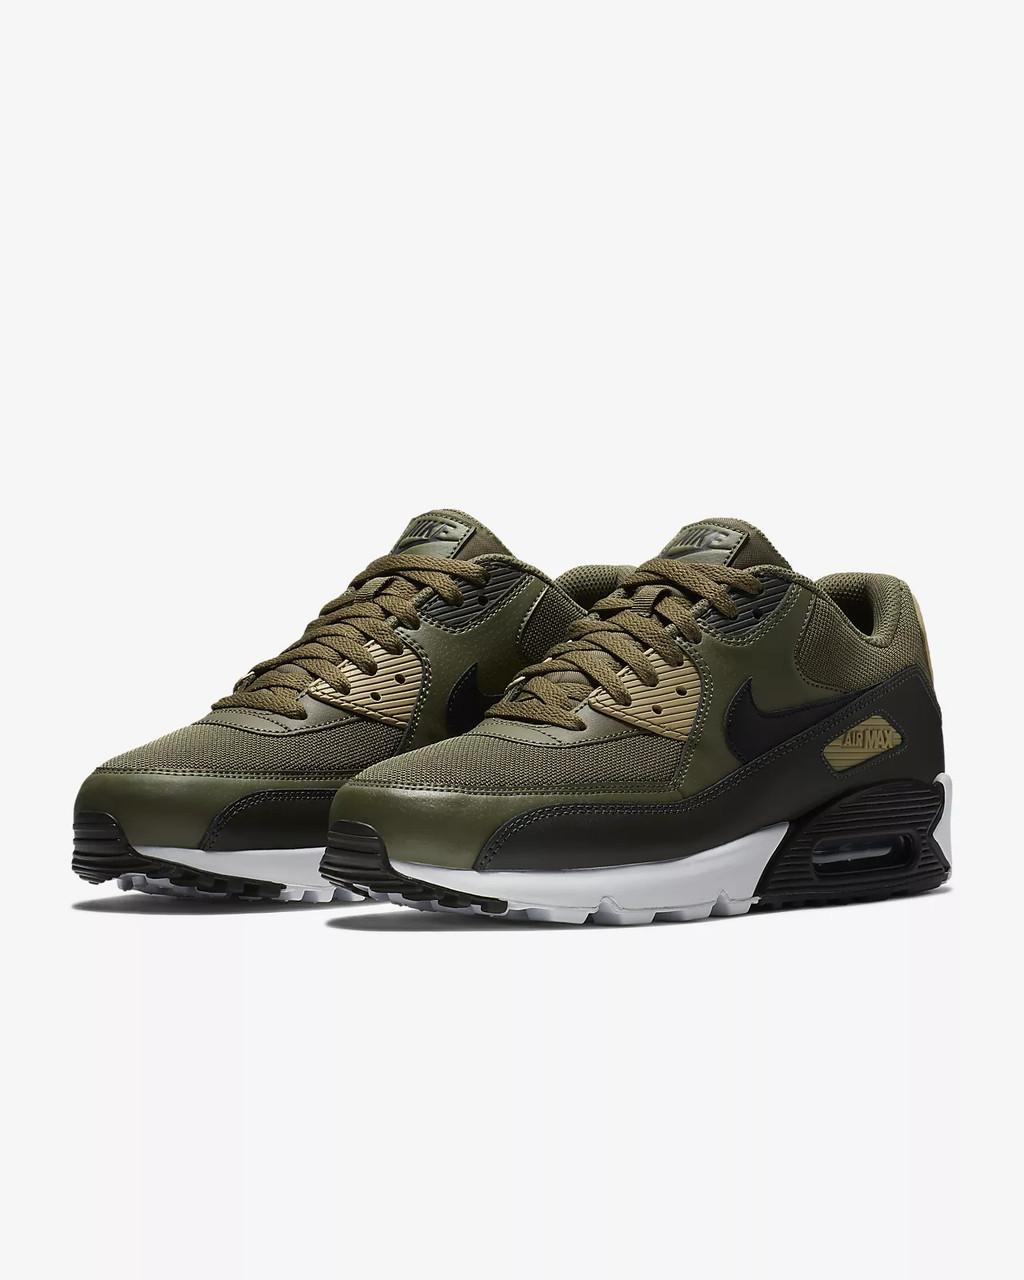 937634c9 Кроссовки Nike Air Max 90 Essential AJ1285-201 (Оригинал) - Football Mall -